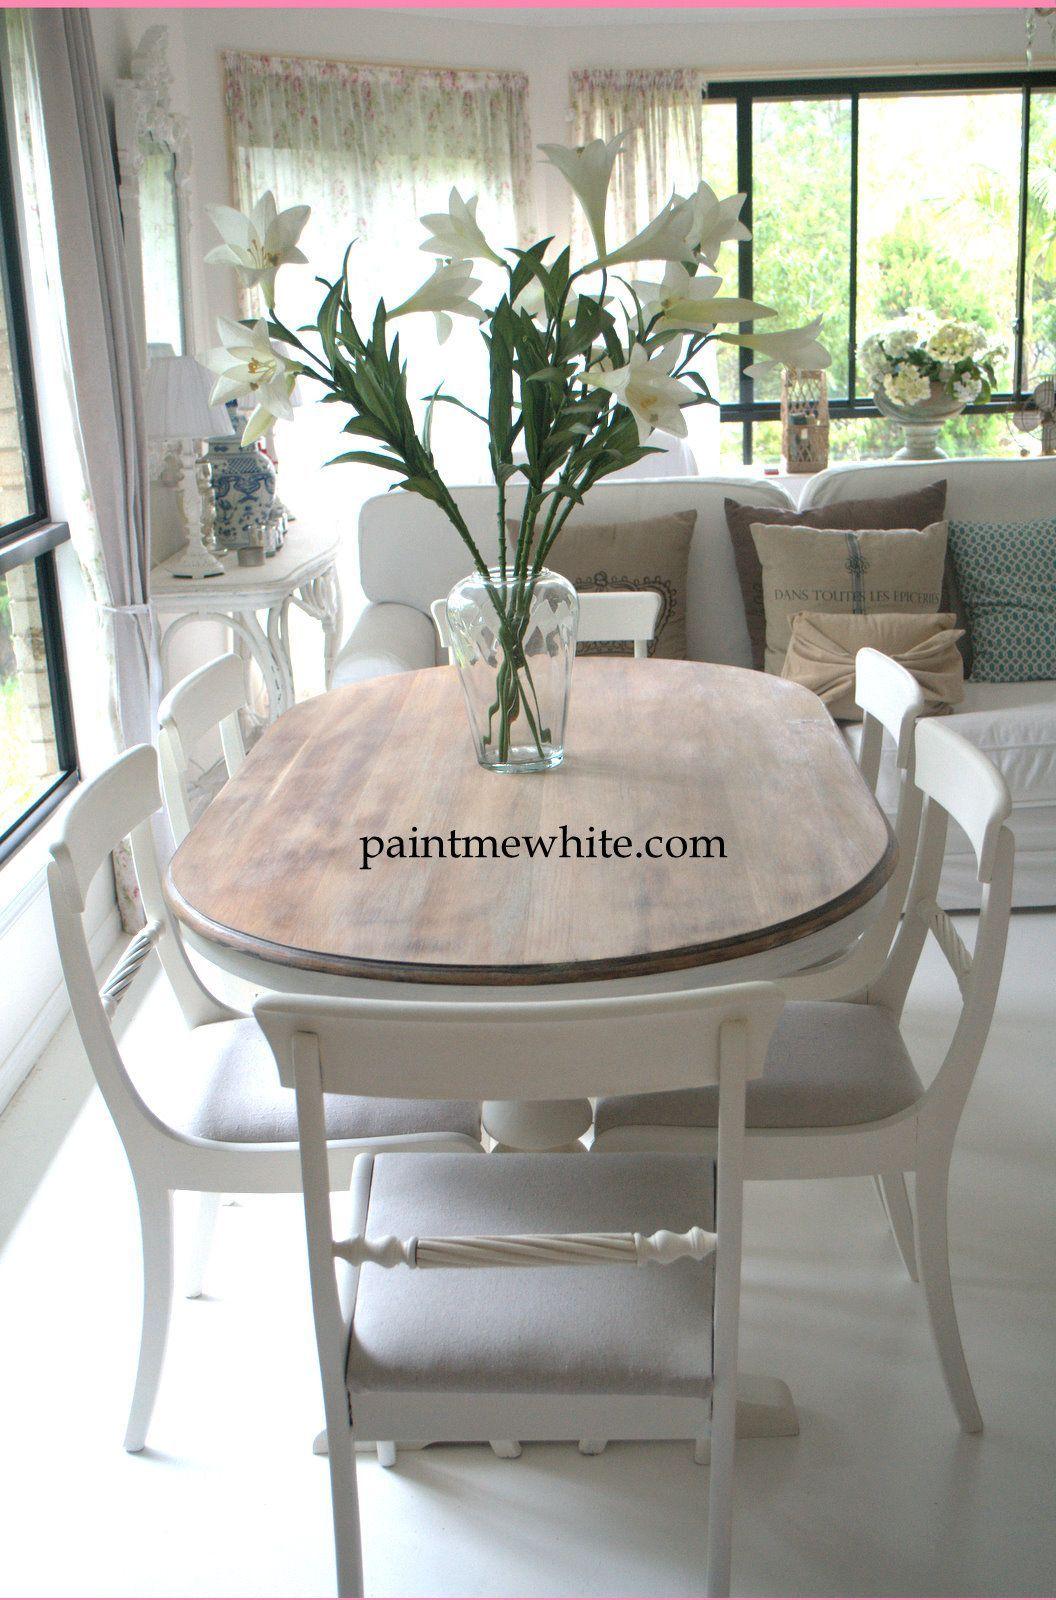 30 beautiful image of dining room redo dining room redo dining rh pinterest com